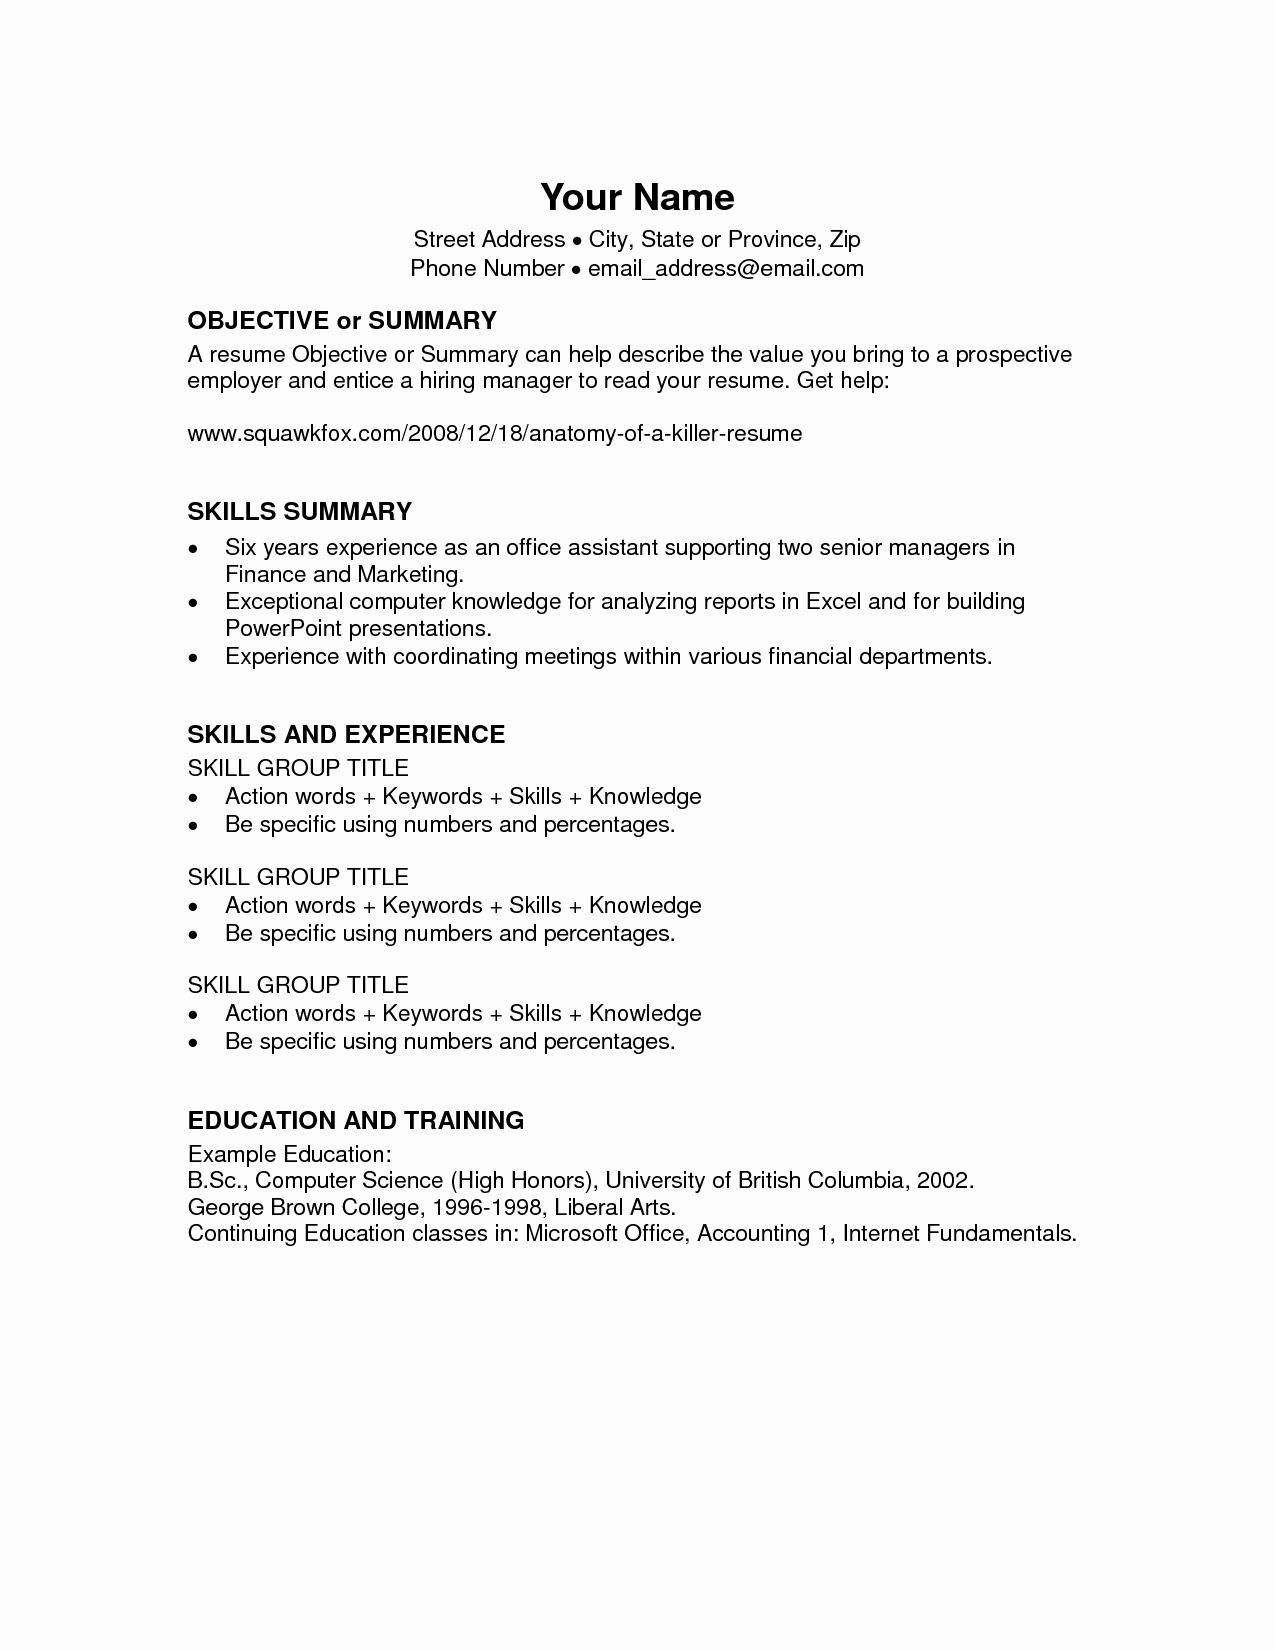 Microsoft Word 2003 Resume Templates Unique Fice